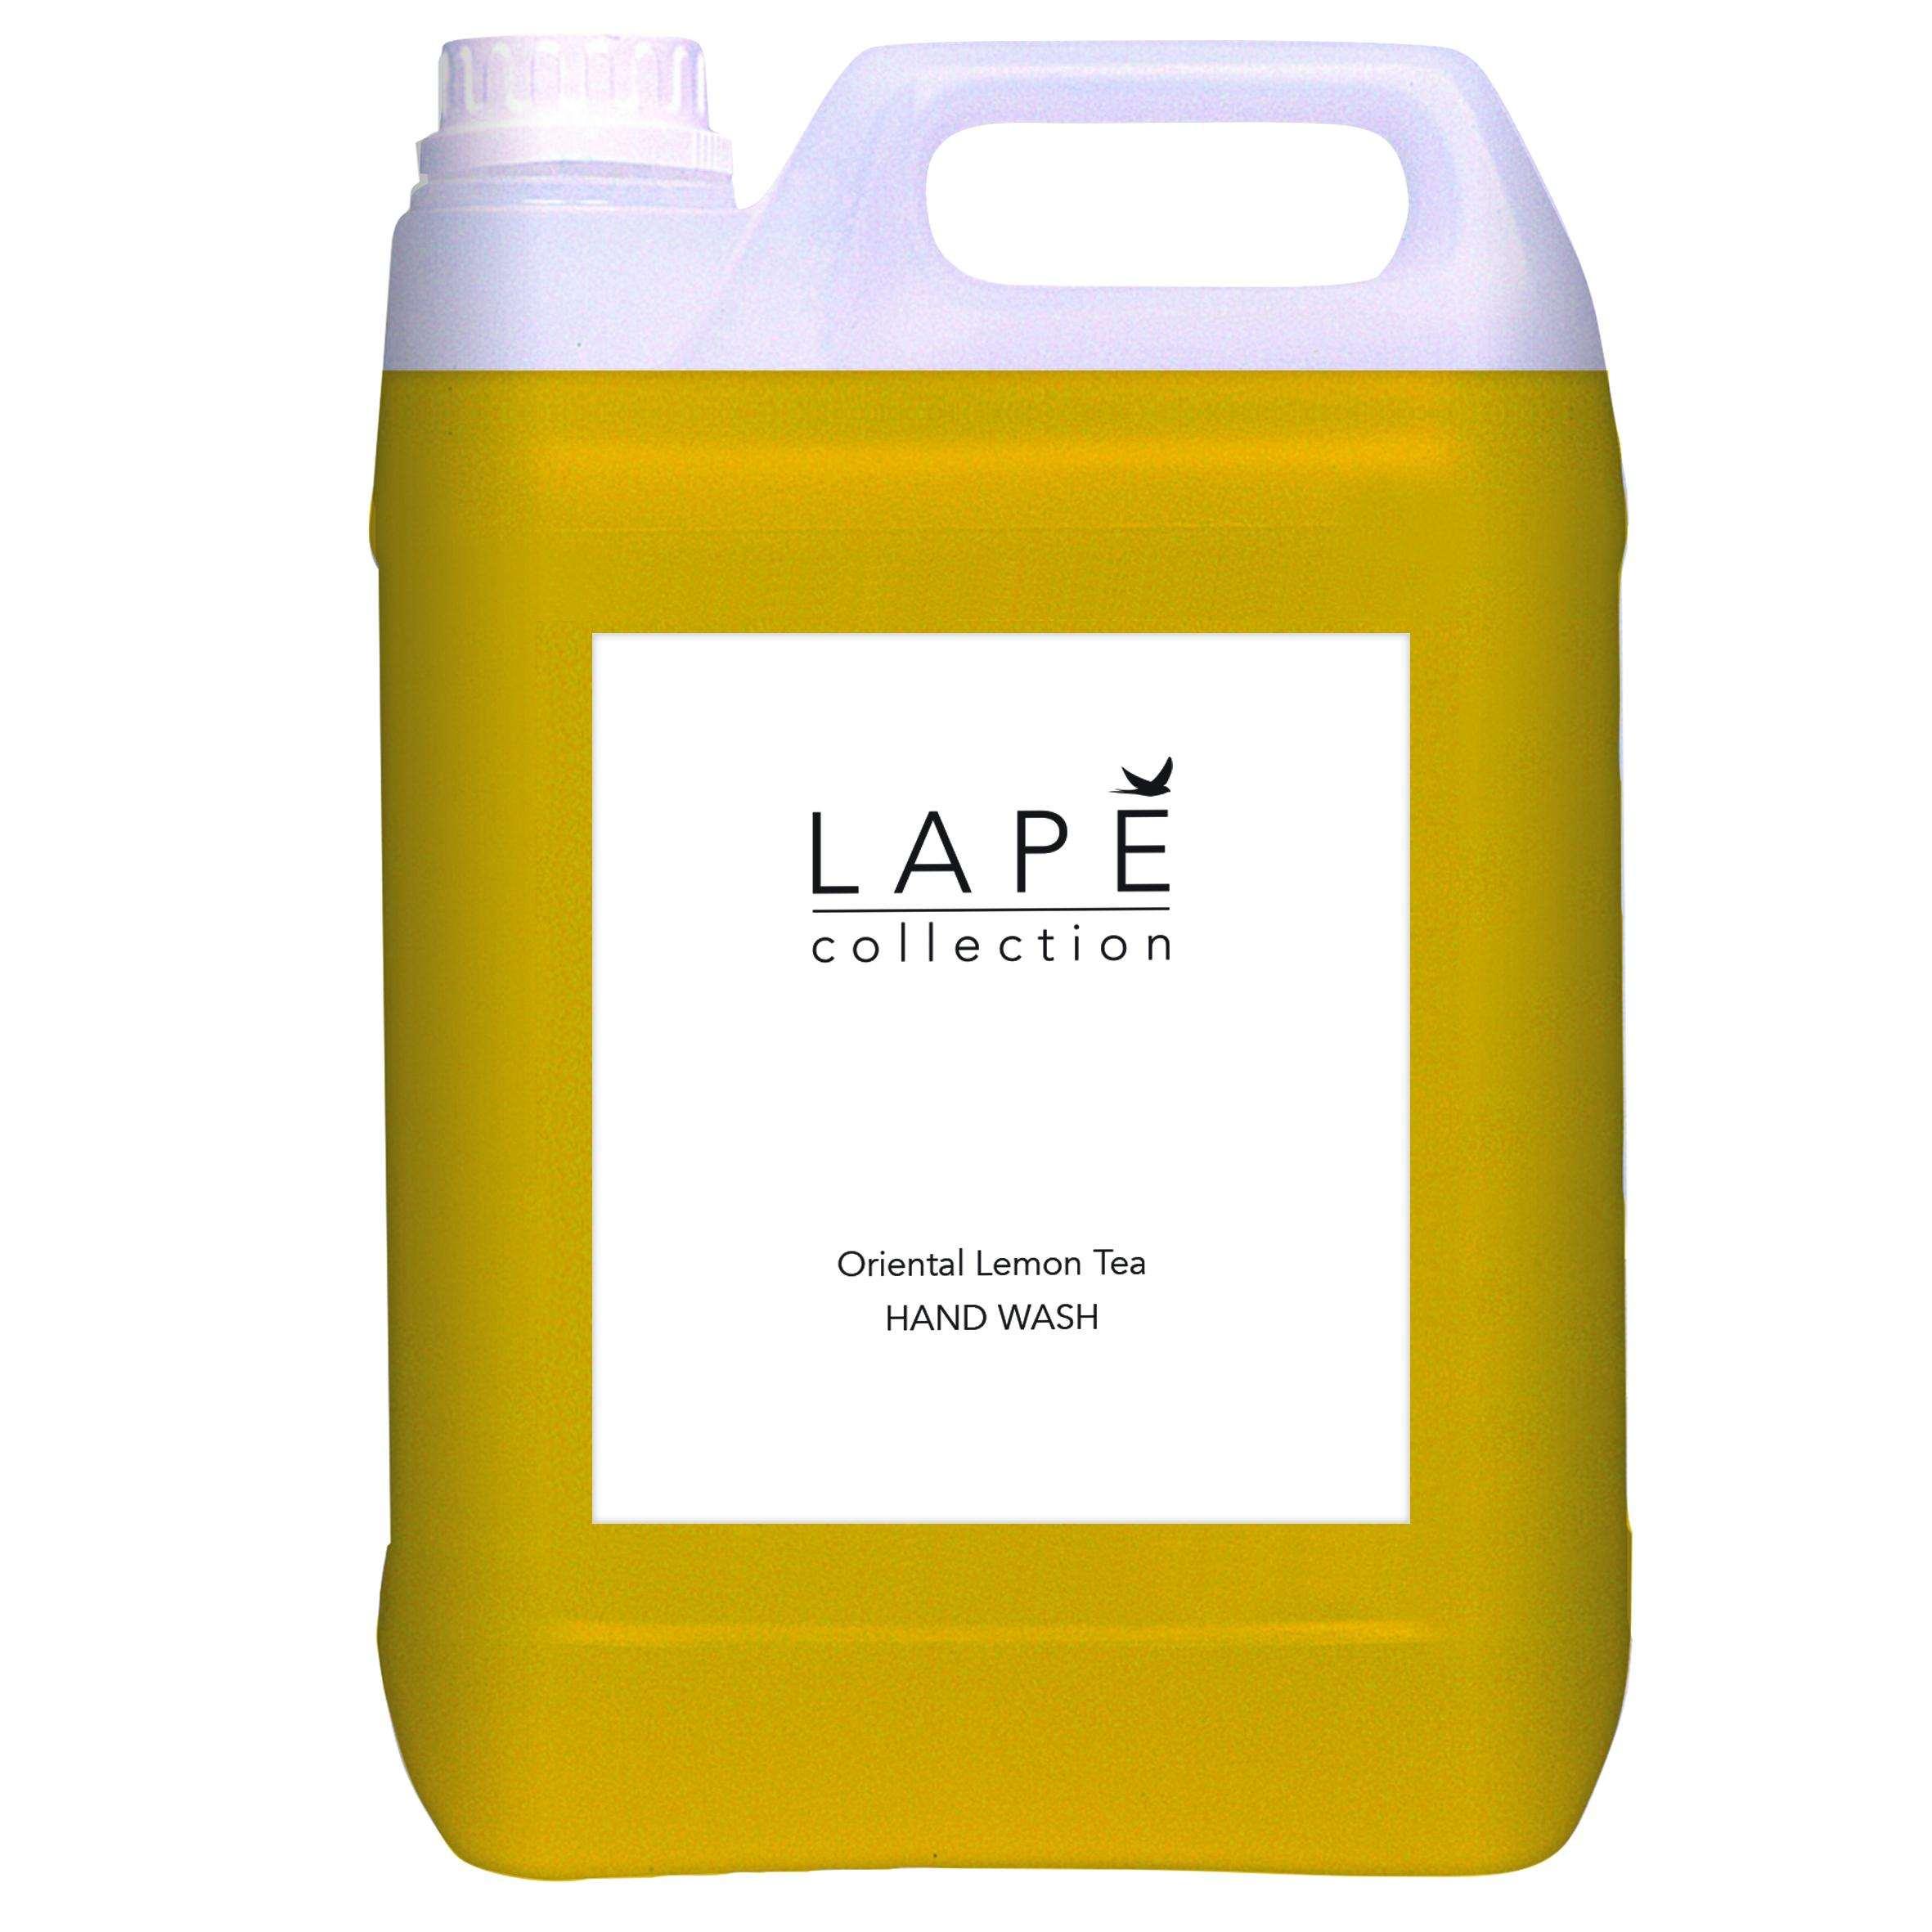 100934575-50858-LAPE-Collection-5L-refill-oriental-lemon-tea-hand-wash-pack-shot-CMKY-20x20cm-20160513122003.jpg